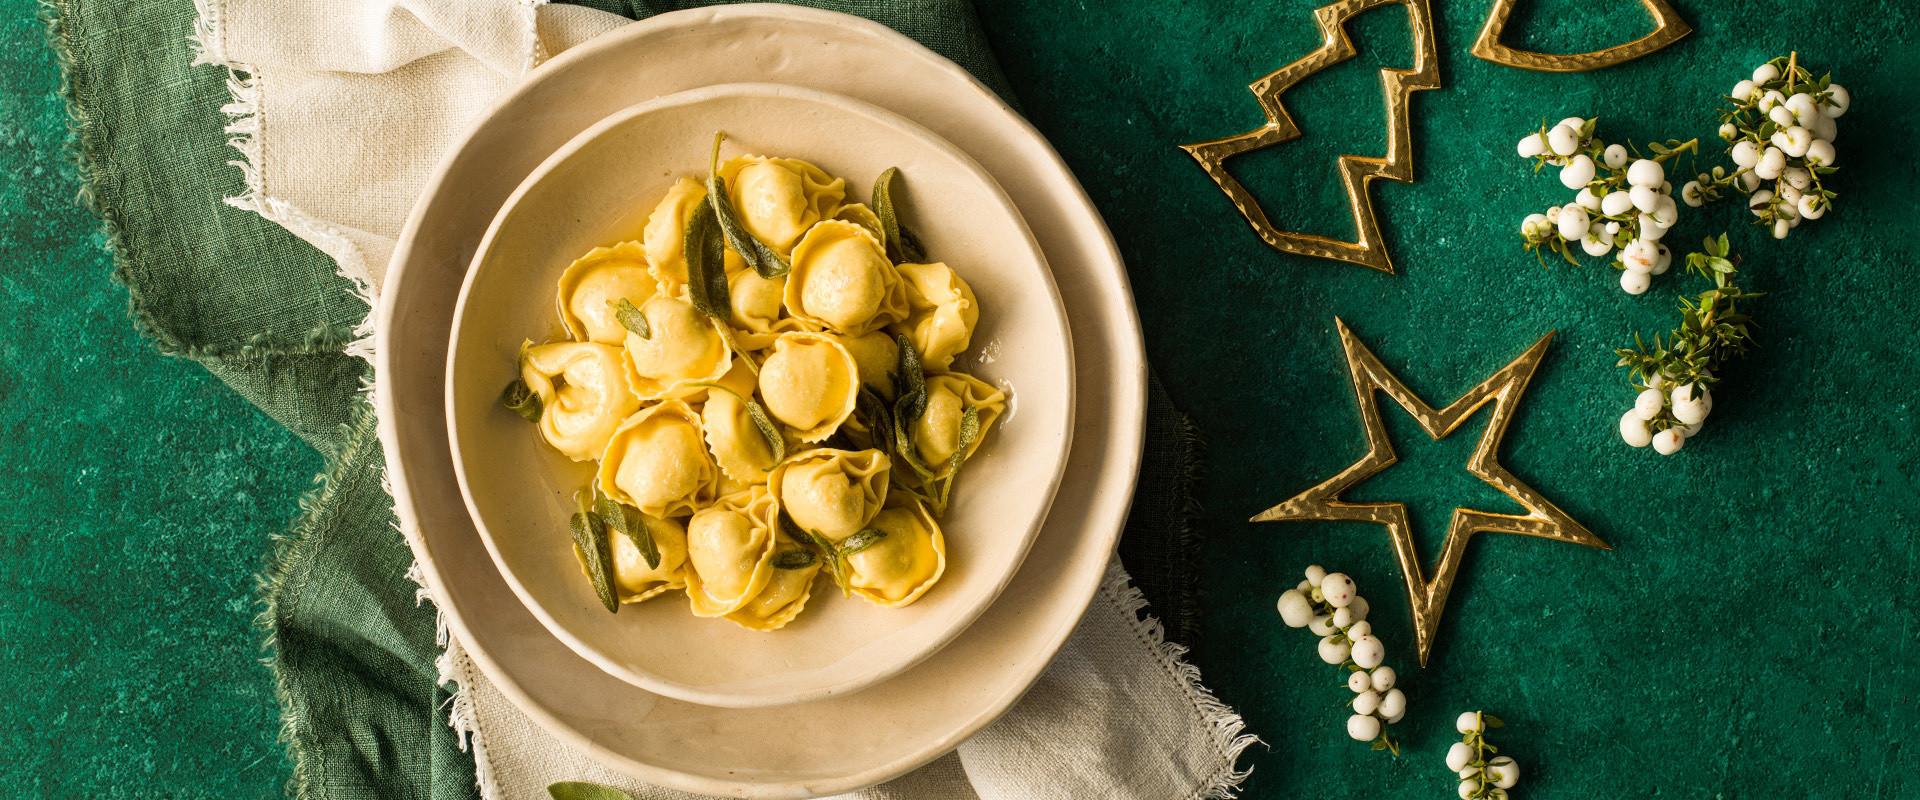 CC-ricette-natale2020-sfogliavelo-ricotta-spinaci-burro-salvia-D.jpg